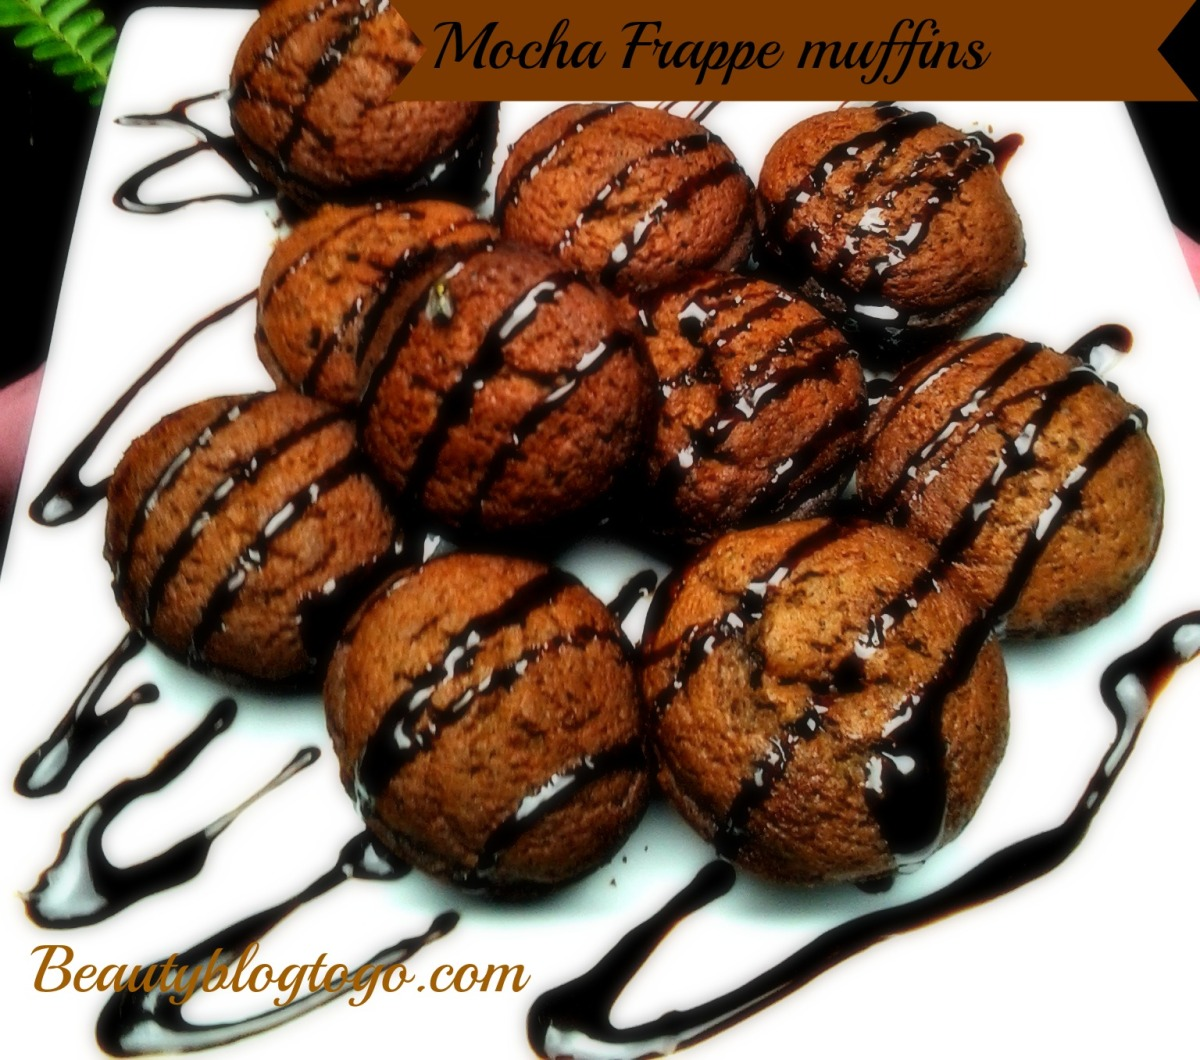 Mocha Frappe muffins